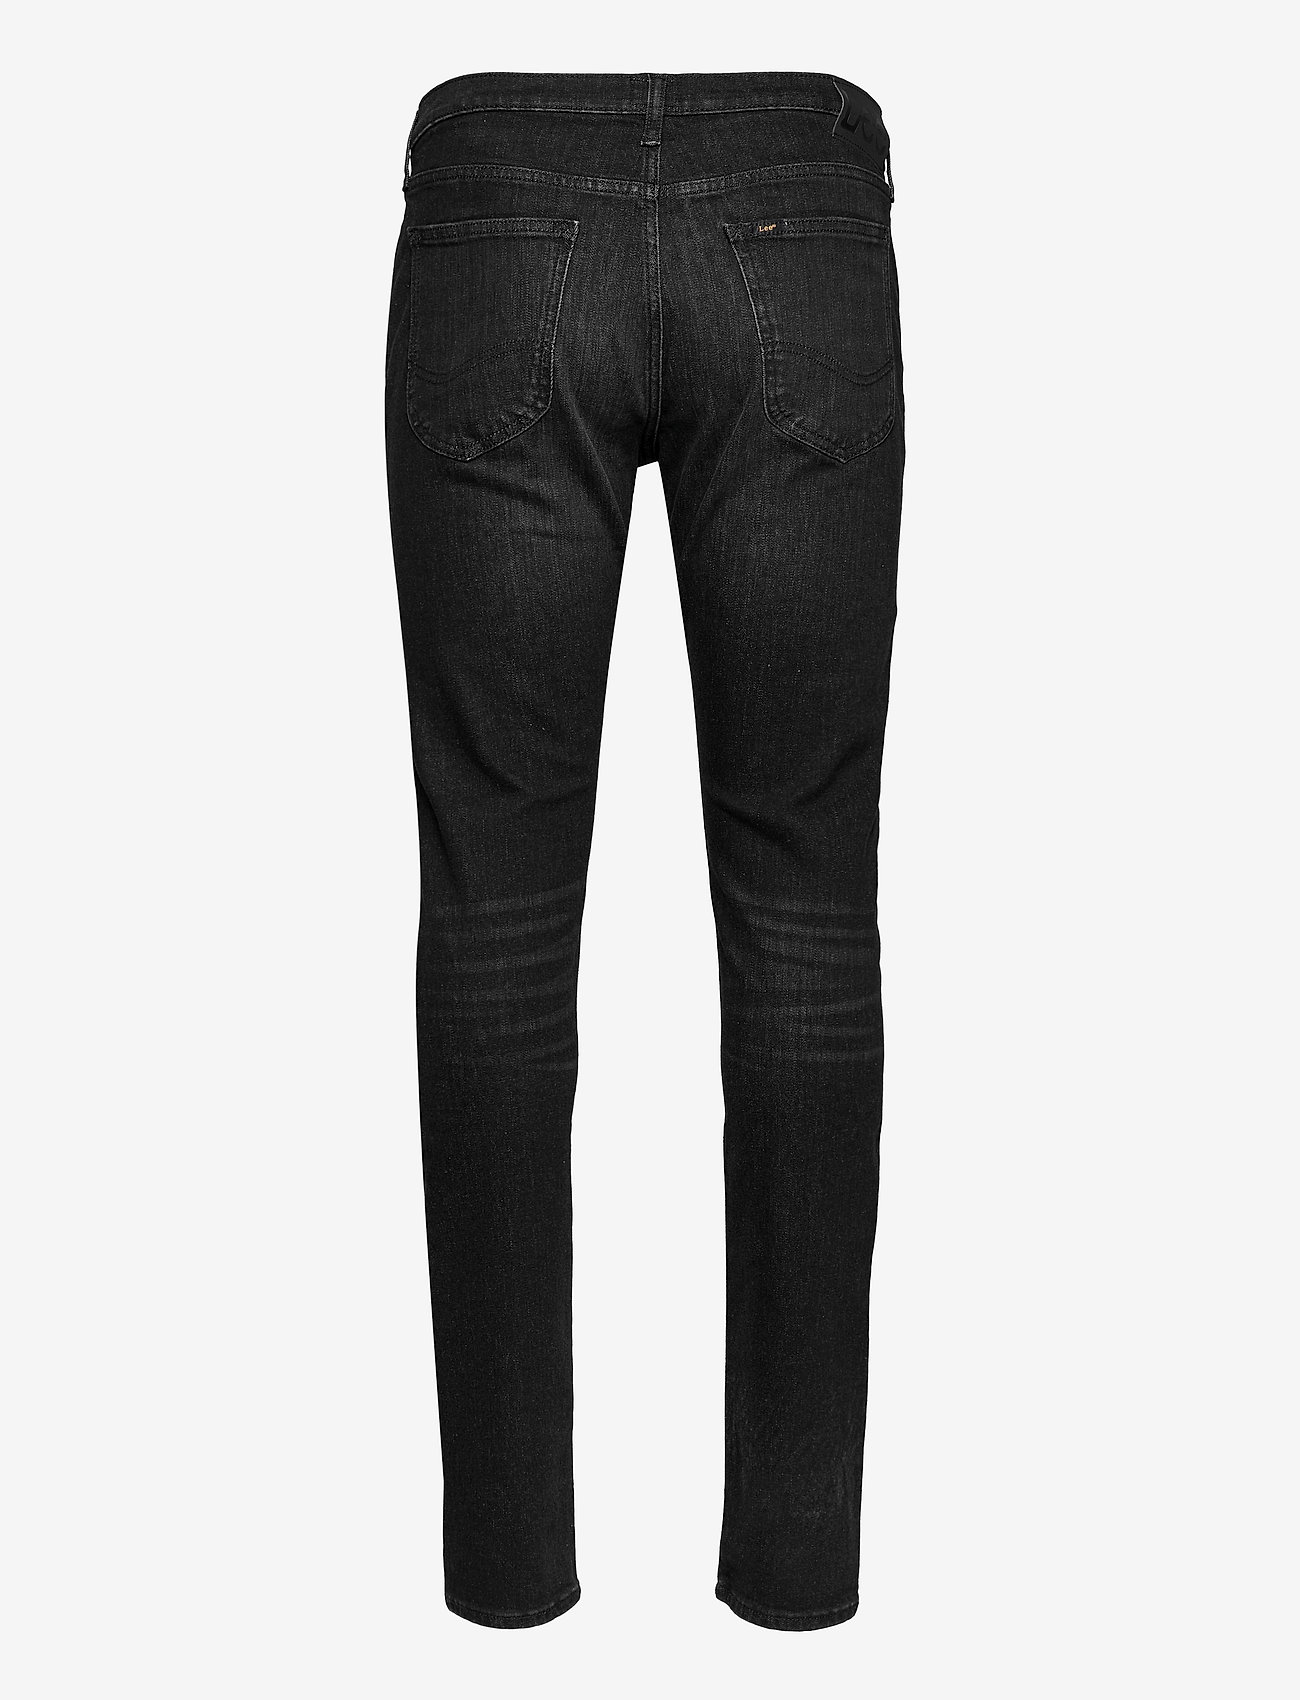 Lee Jeans - LUKE - slim jeans - worn magnet - 1